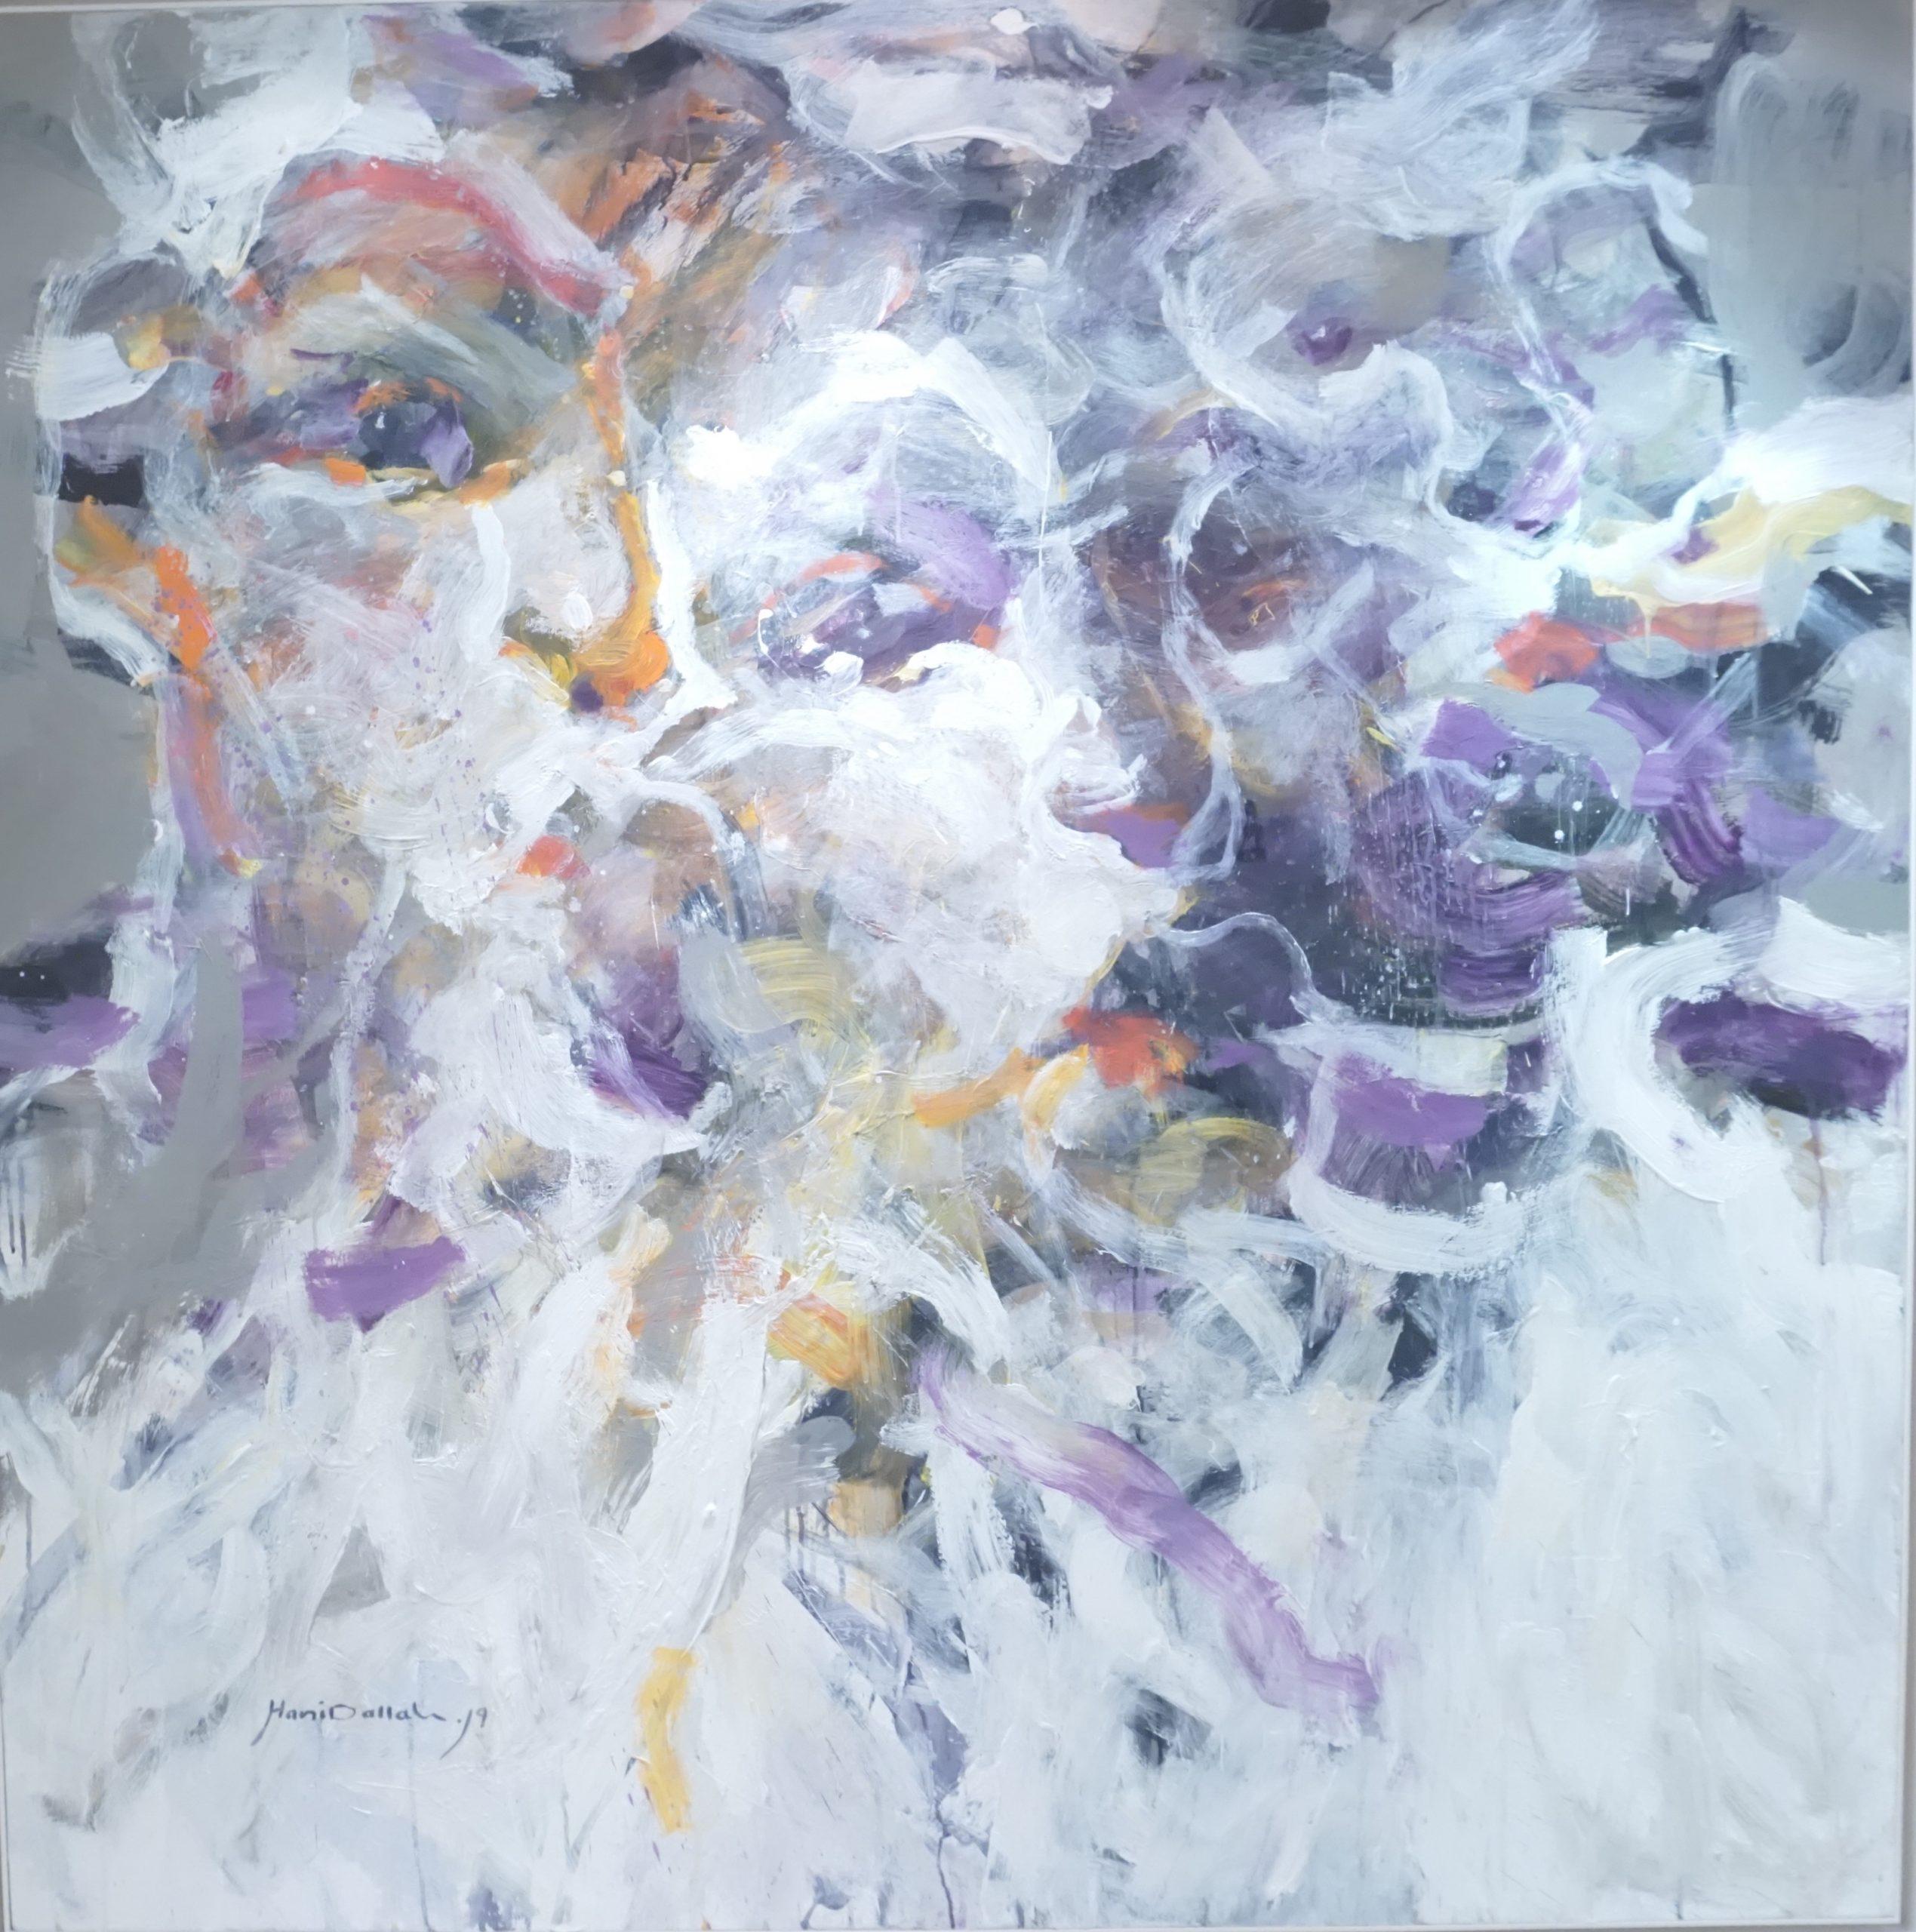 Iraqi artist Hani  Dallah